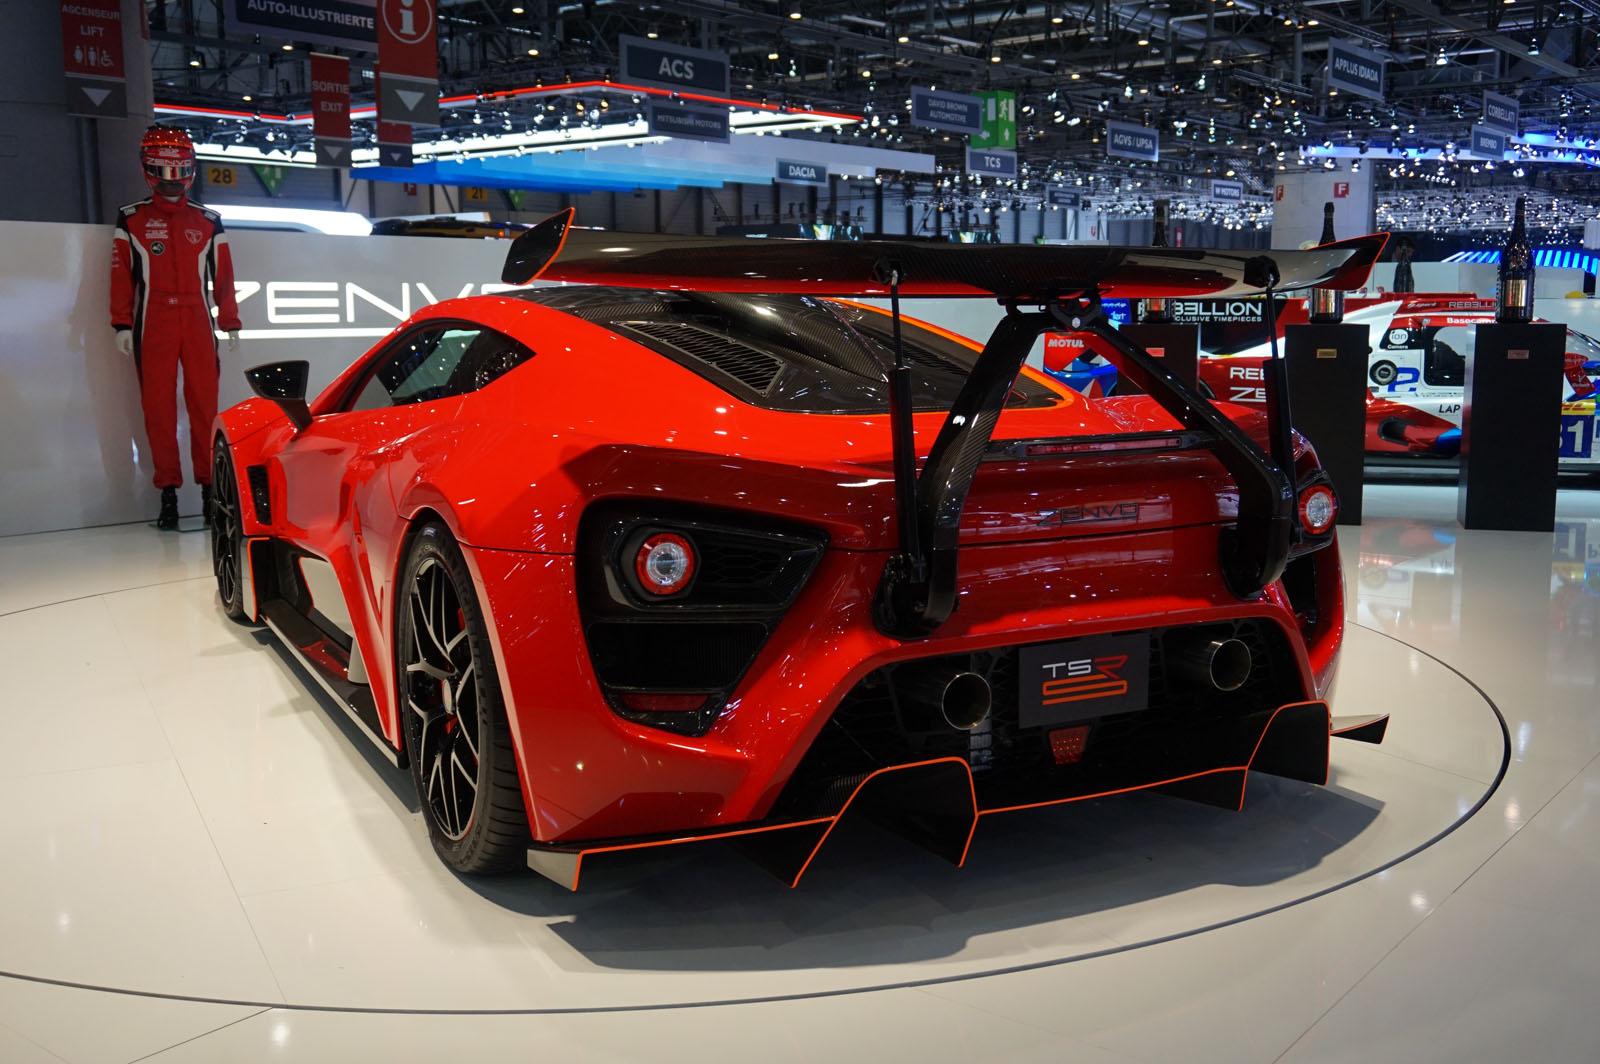 Top 5 Exotic Cars of the 2018 Geneva Motor Show - Luxury4Play.com